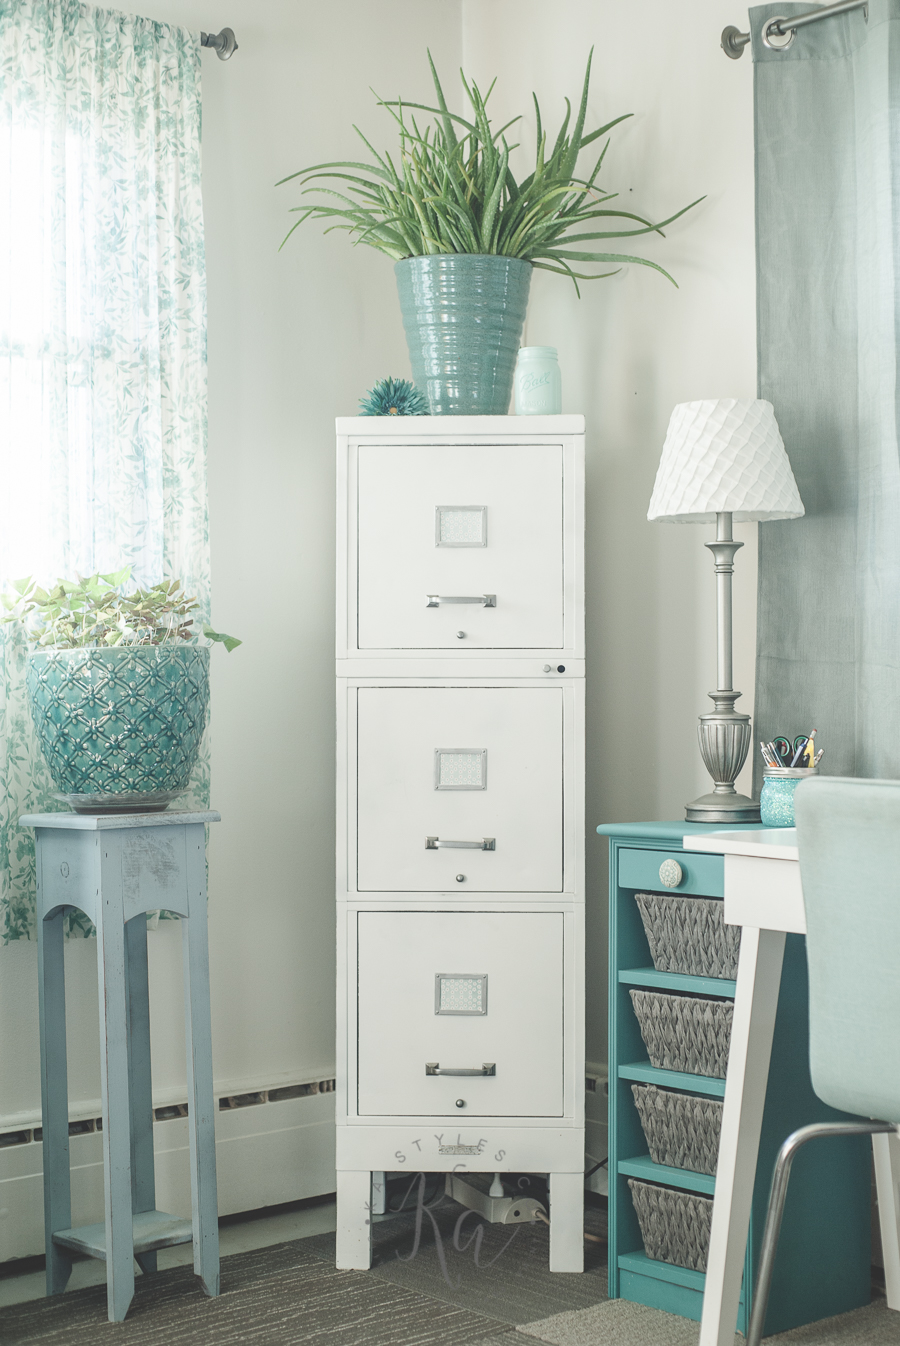 Krylon chalky finish spray paint 100 year old file cabinet makeover. & My 100 Year Old File Cabinet Makeover - KA Styles